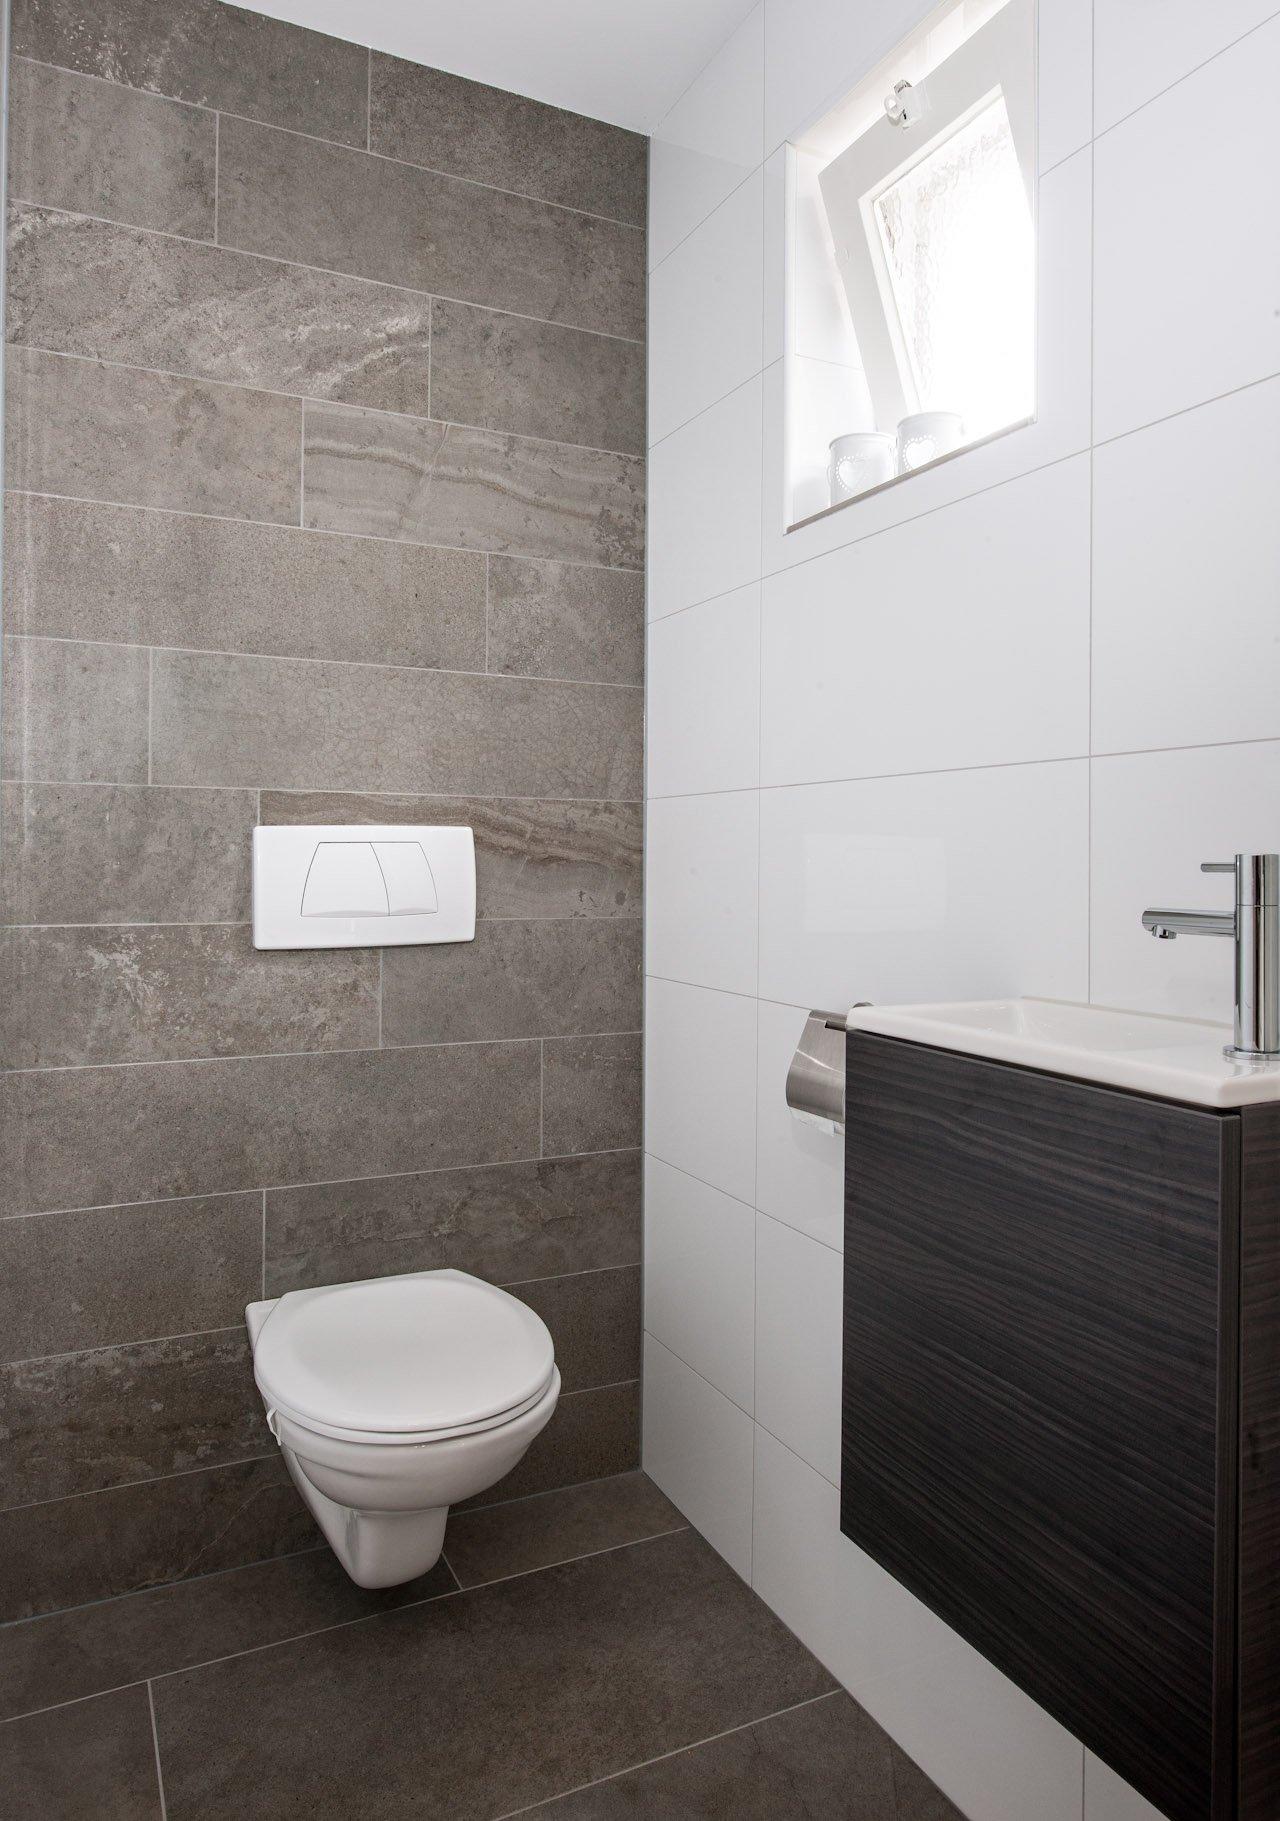 Mooie Badkamer Kranen ~ Grote tegels in hal en badkamer  KROON Vloeren in Steen